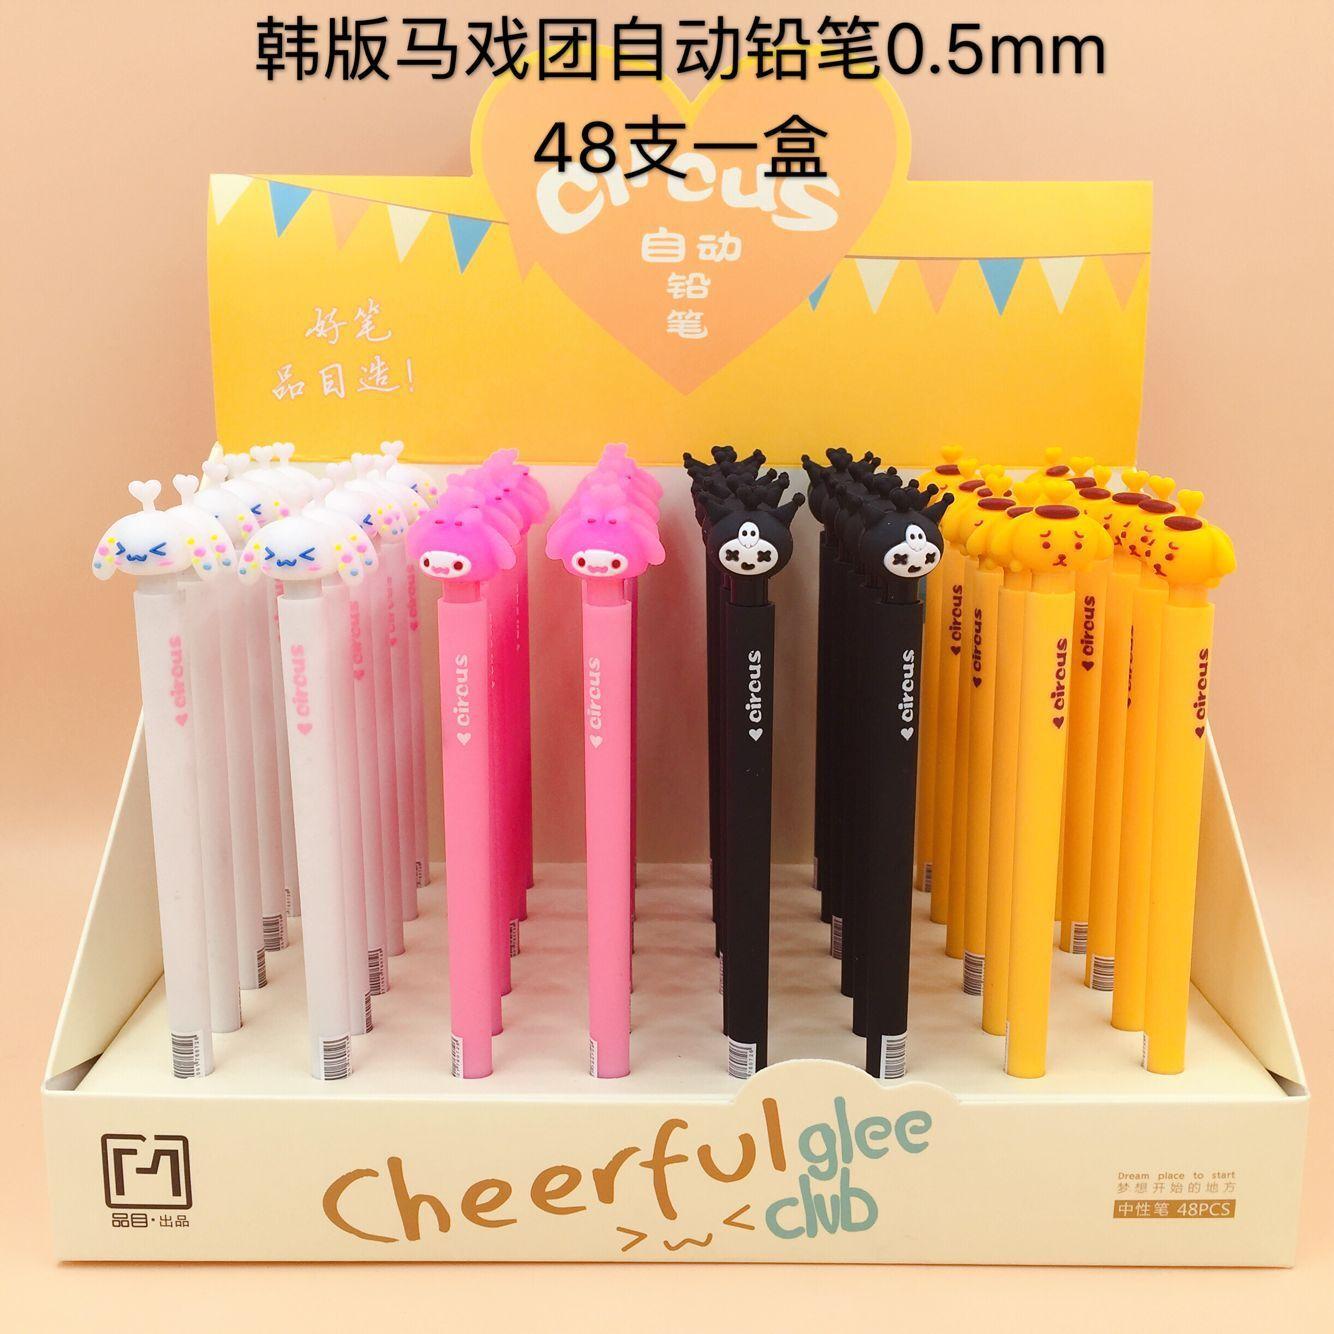 48 pcs 1 lot Kawaii circus press Mechanical Pencils School Office Supply Student Stationery Kids Gift